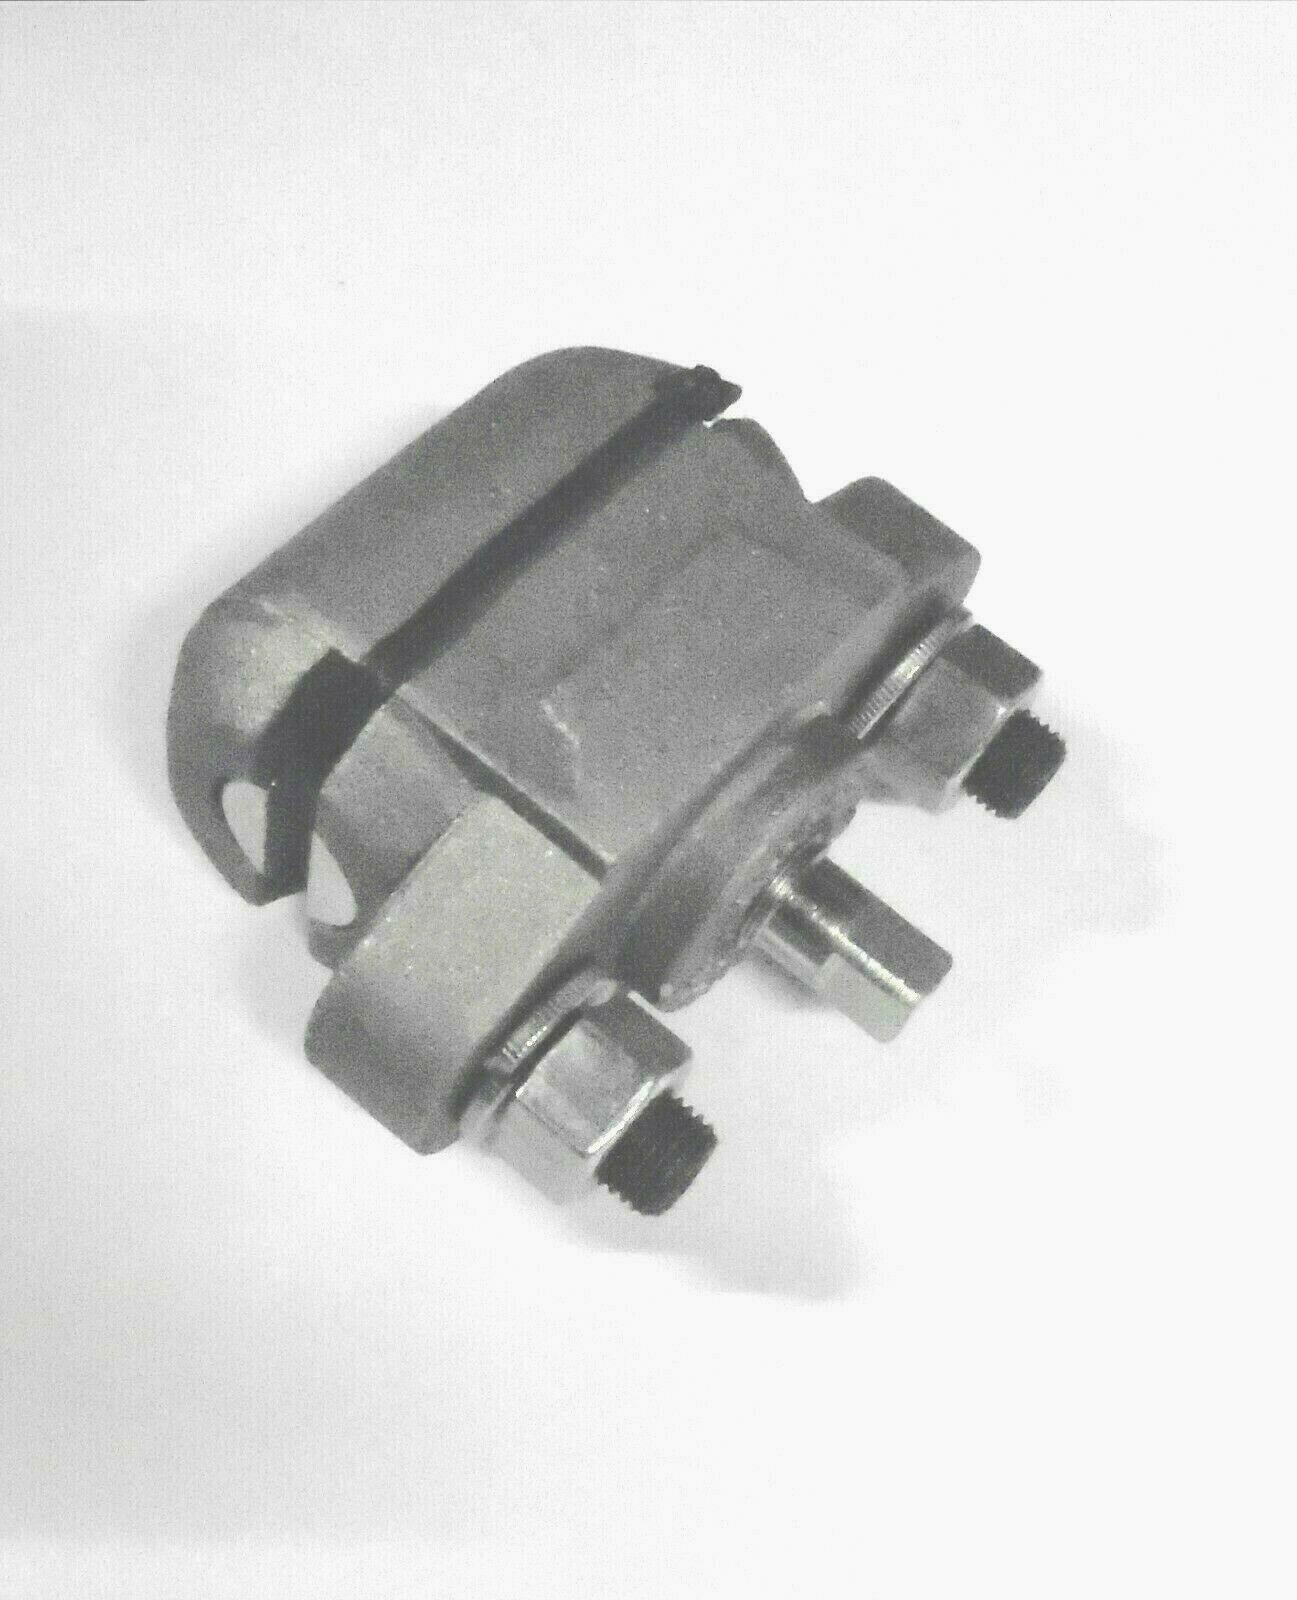 BRAKE ADJUSTER REAR x1 (Humber Imperial) (1964- 66)